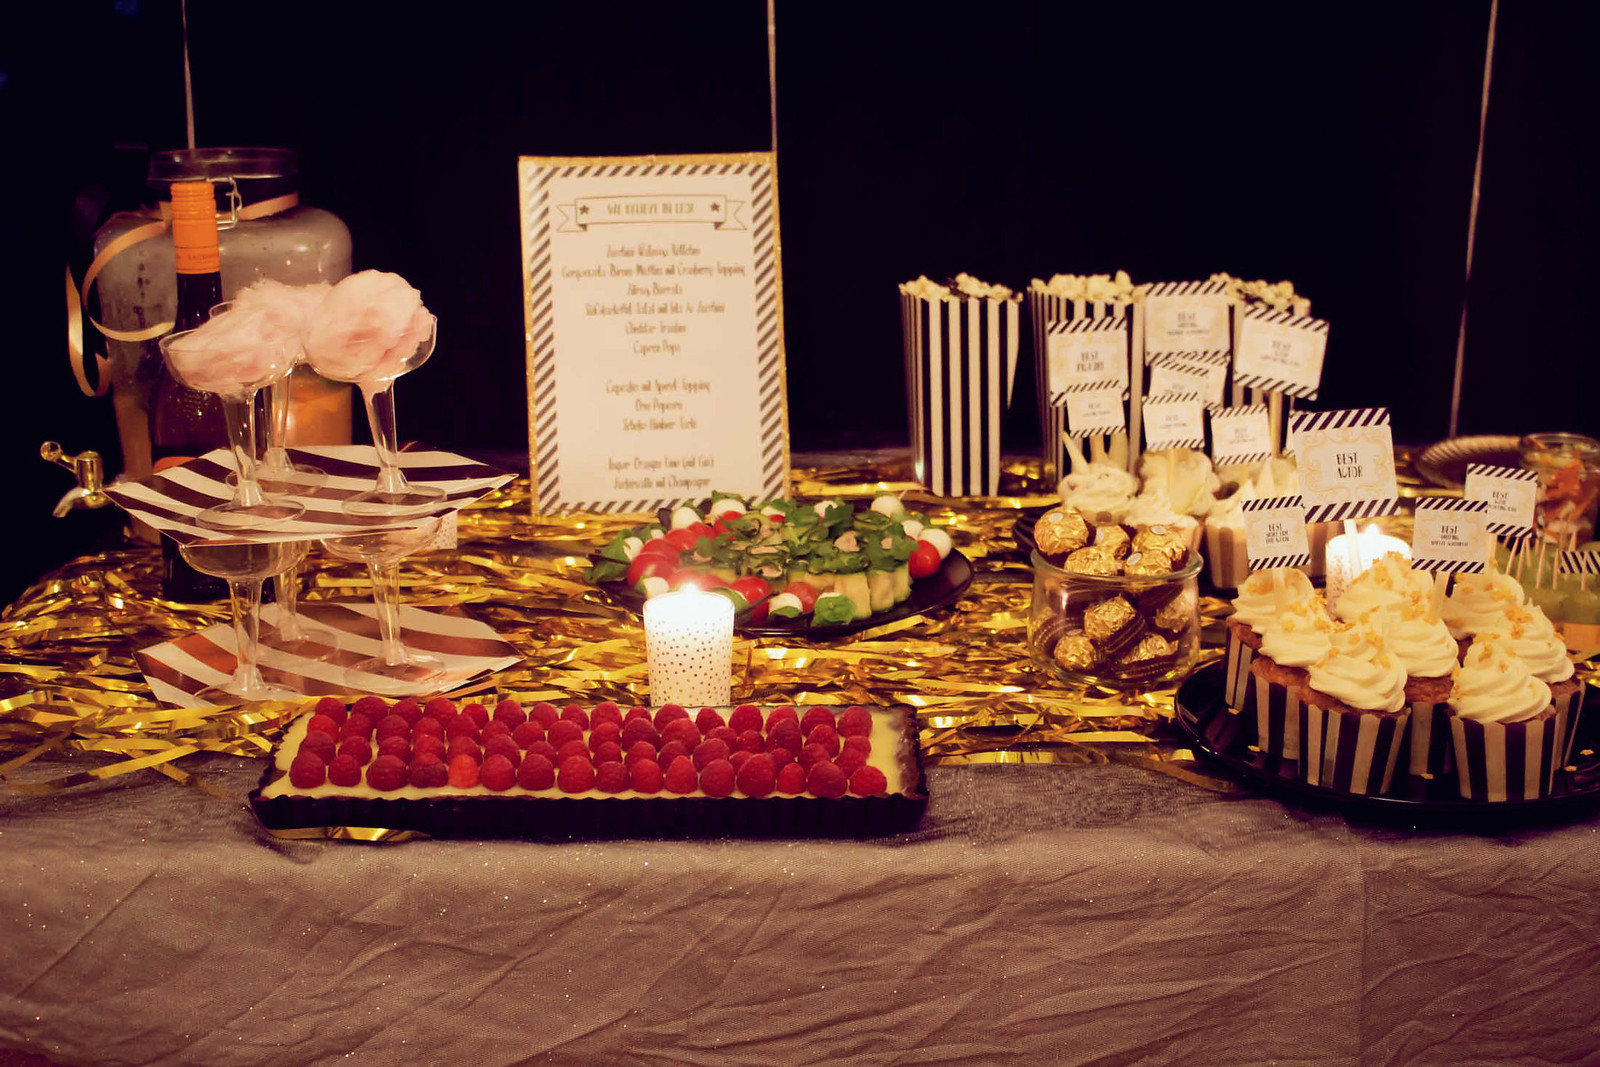 schoko-himbeer-tarte mit weißer schokolade {oscar buffet 2016}